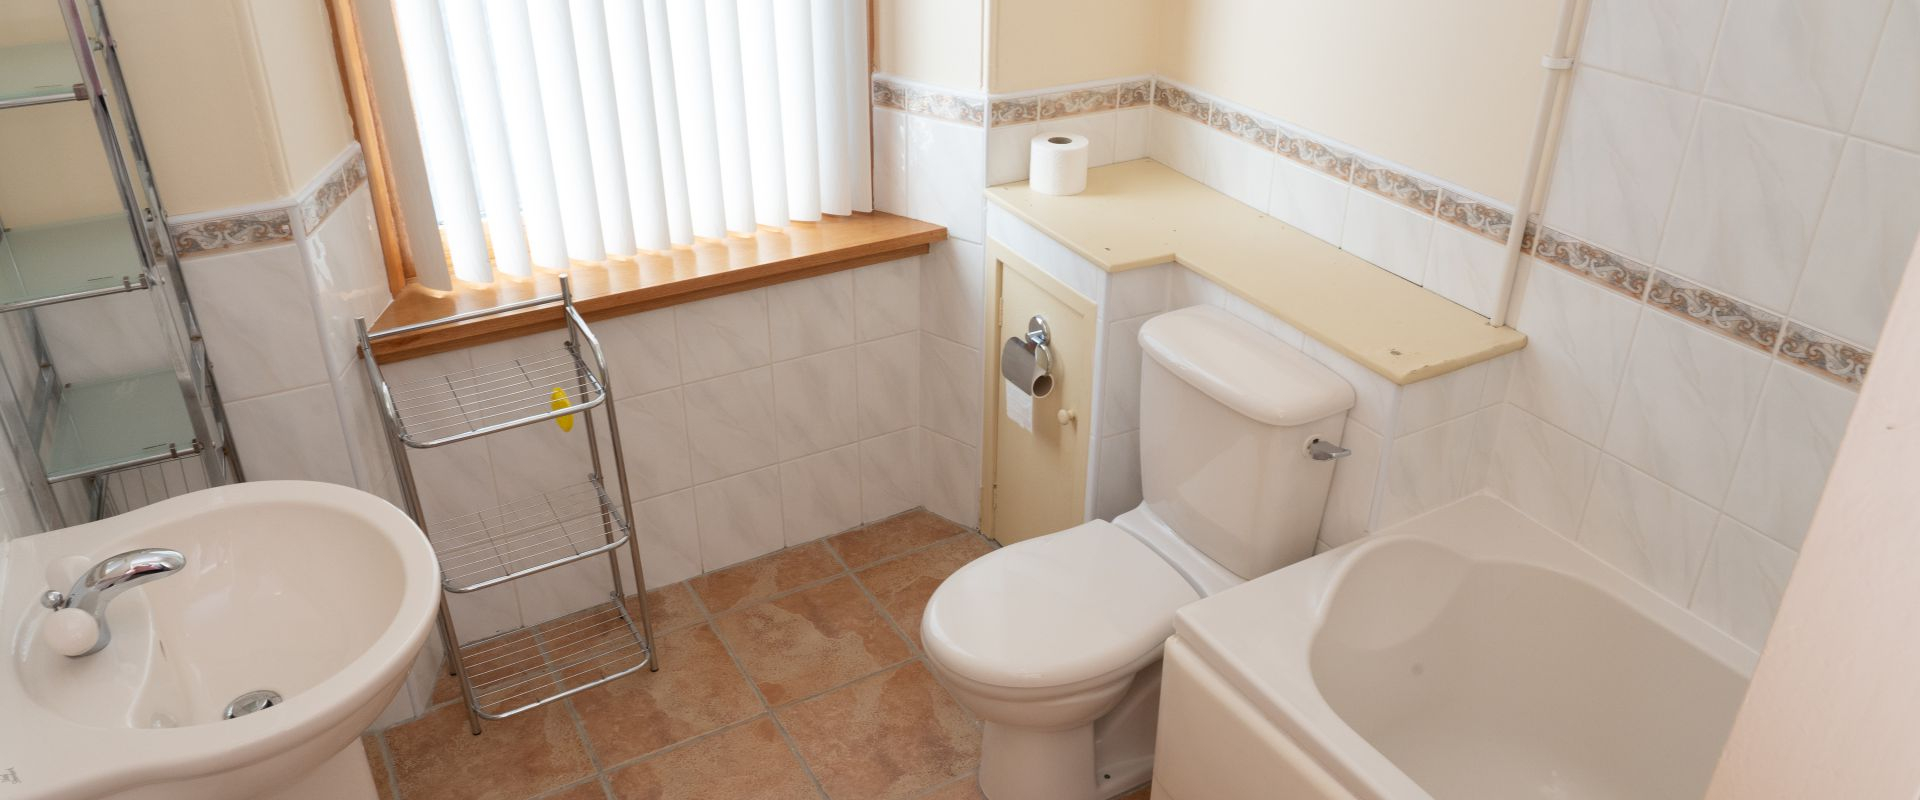 ARD-Properties-Development-Sites-Buy-Homes-Rent-Aberdeenshire-Rentals-2a-St-Andrew-Streeet-Peterhead-Banner (5)